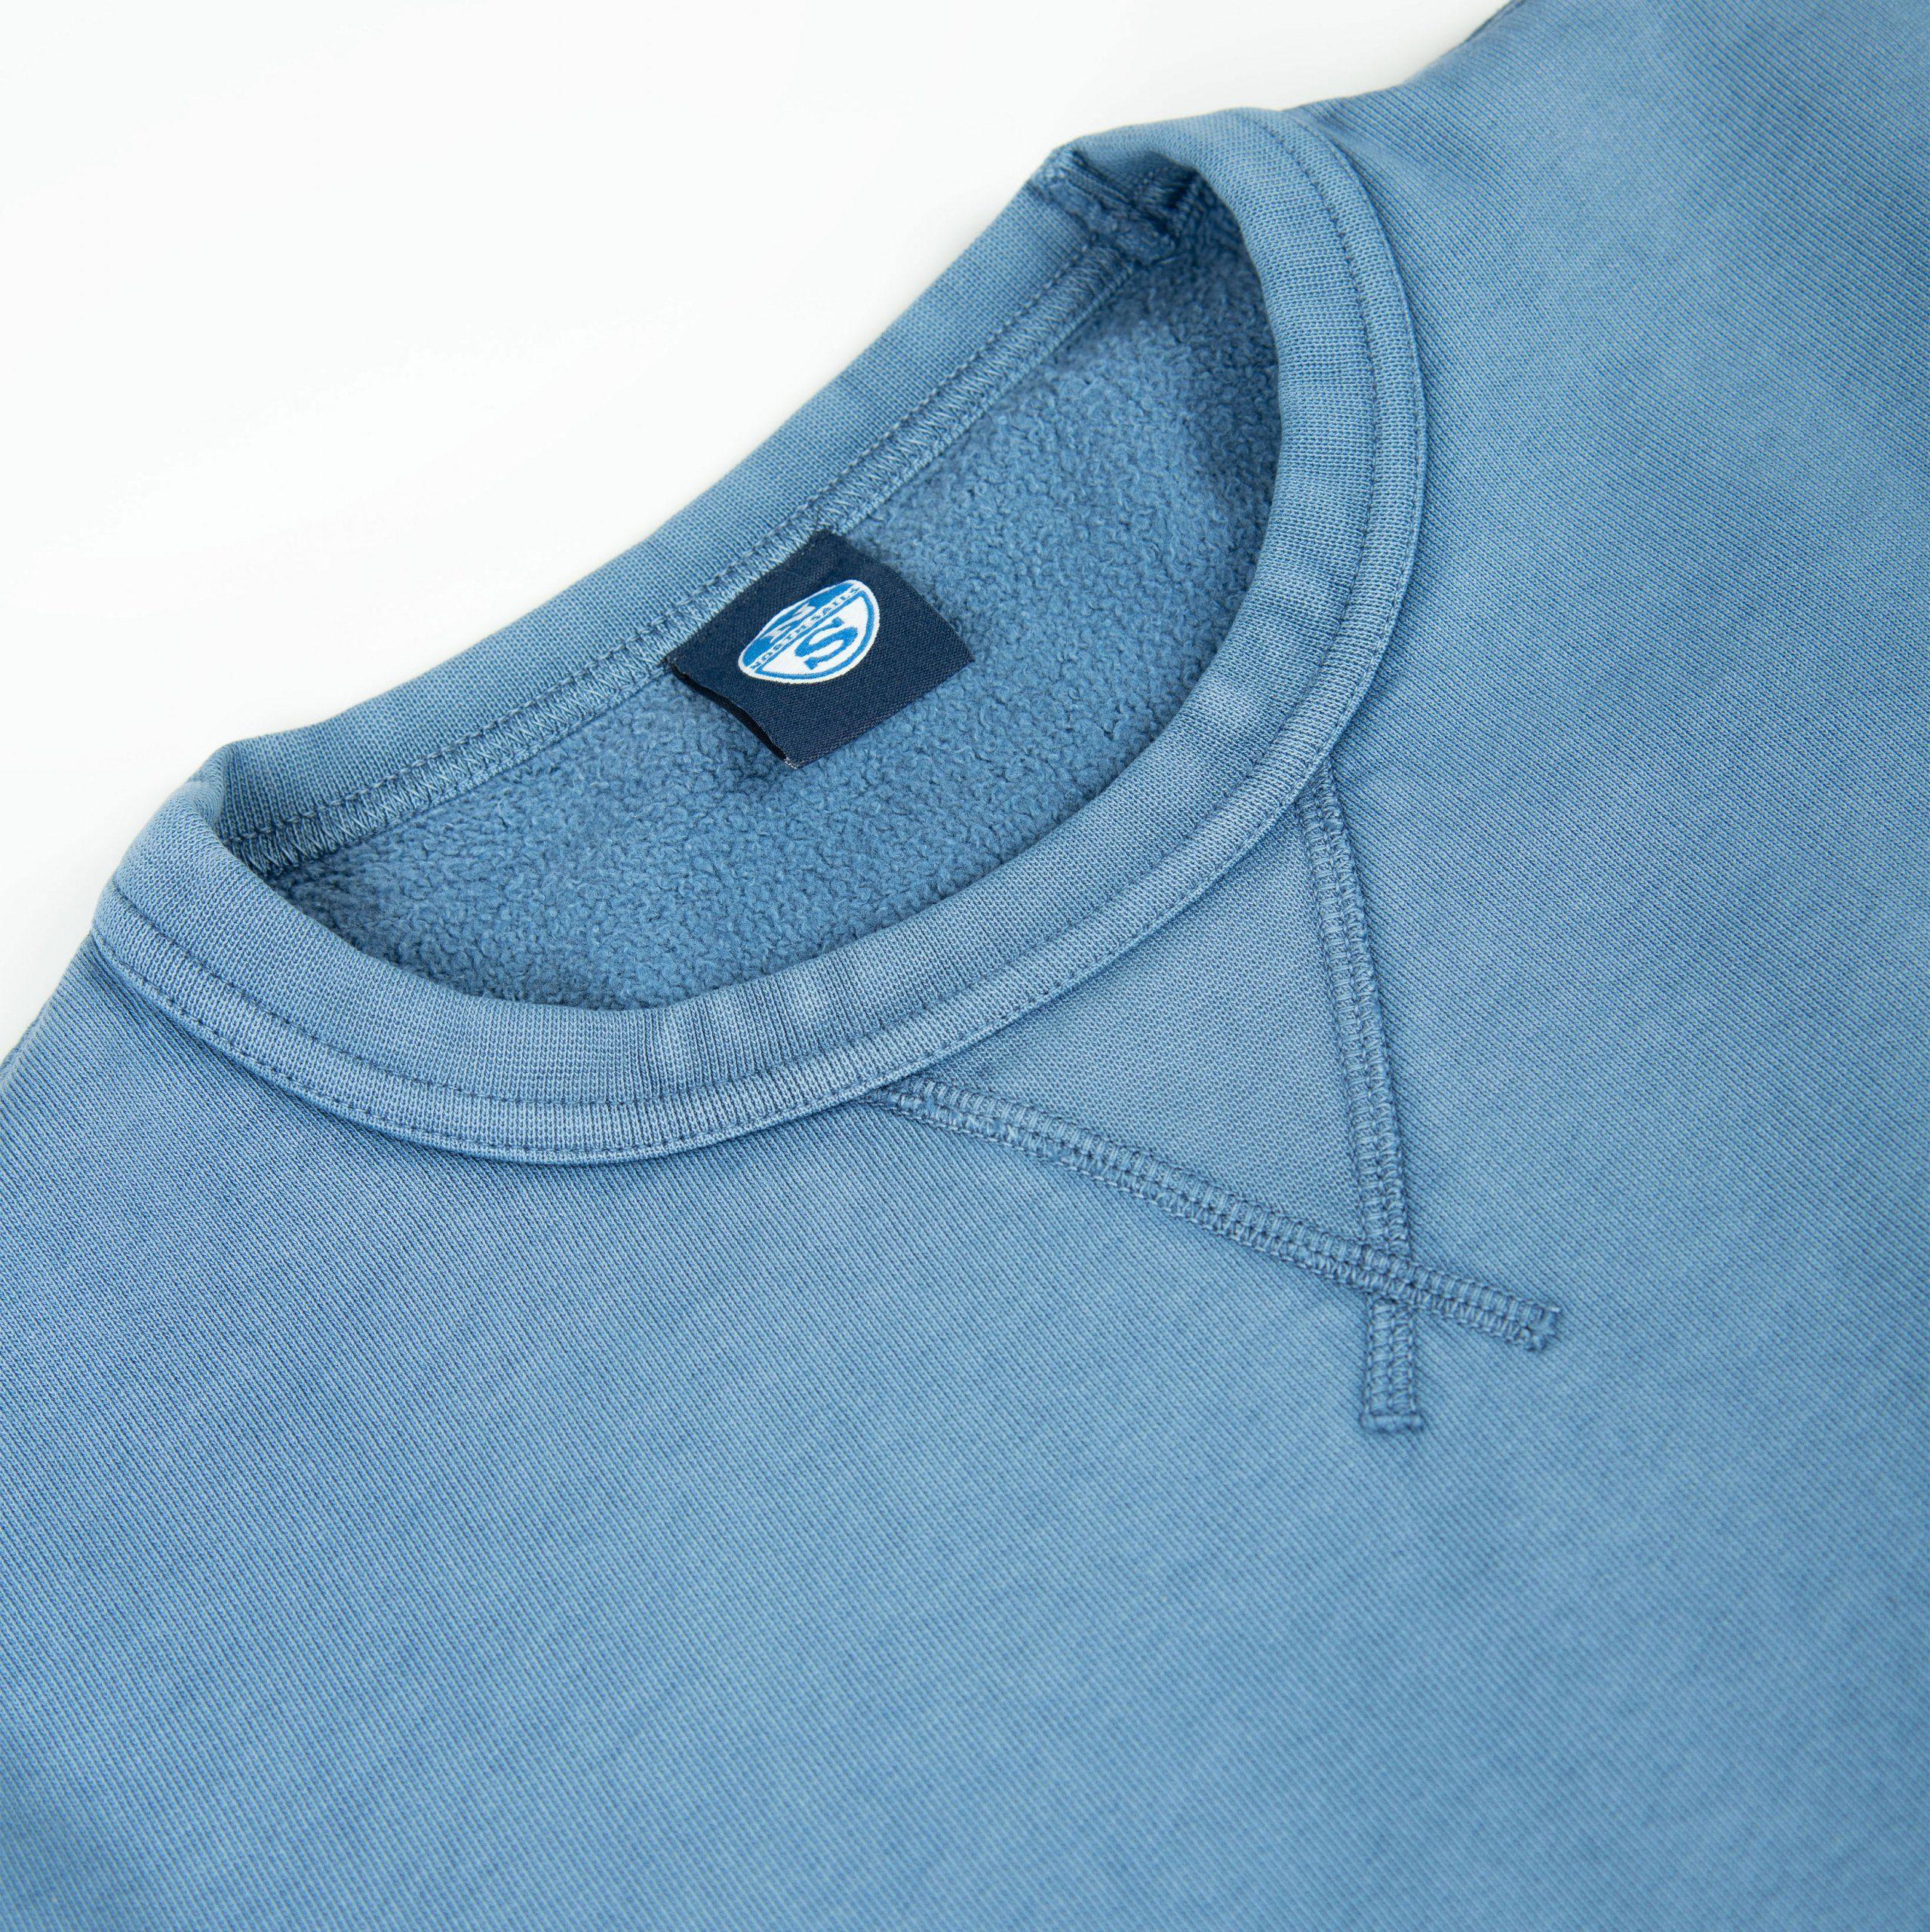 Poloshow North Sails Sweatshirt Jeans 691547 000 0790 500 3